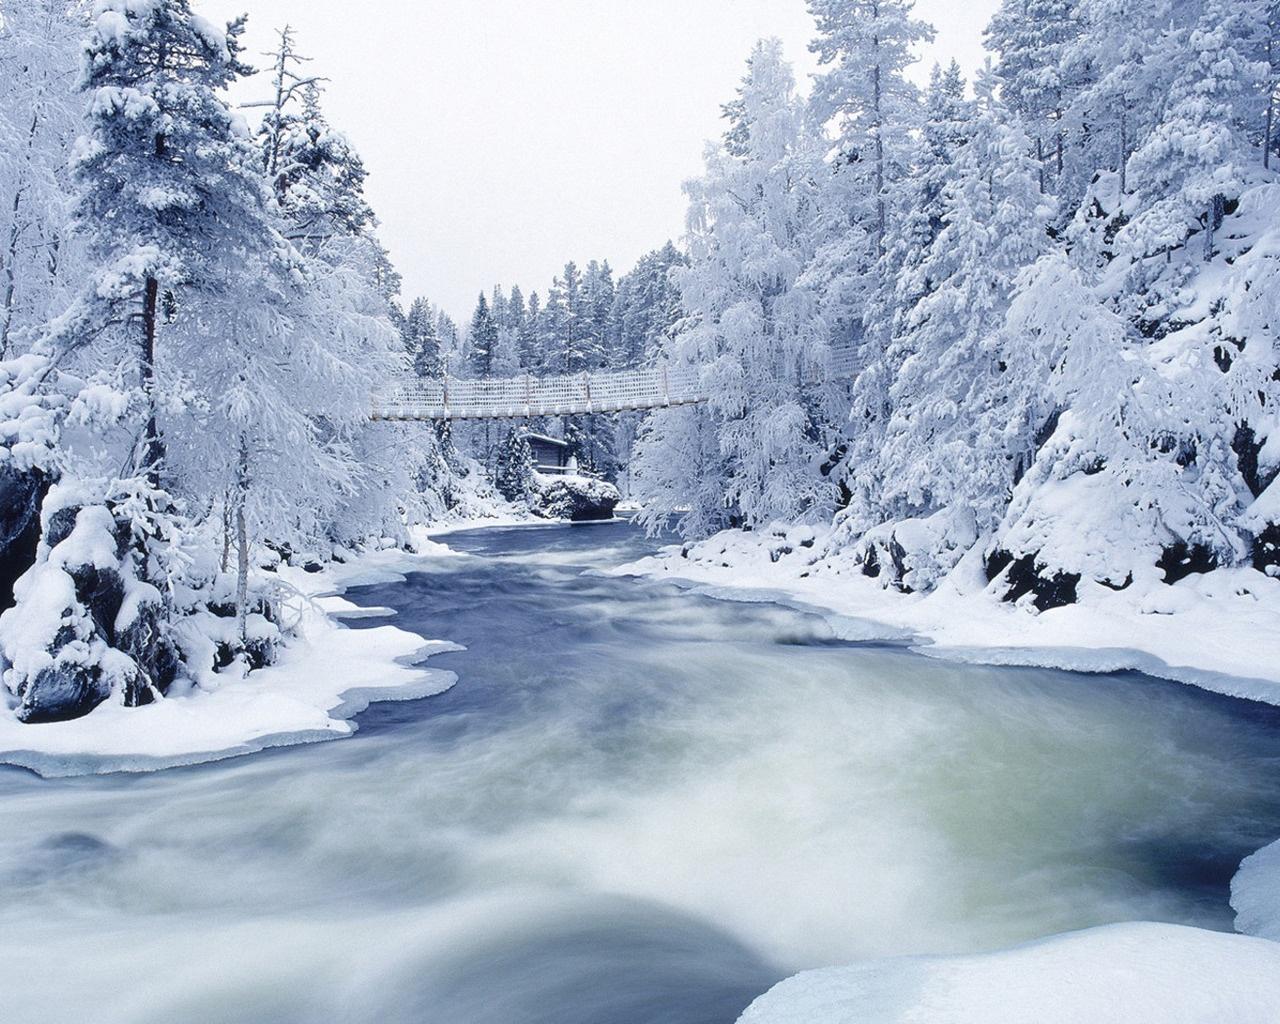 Winter wallpapers Winter Forest 019431 jpg 1280x1024